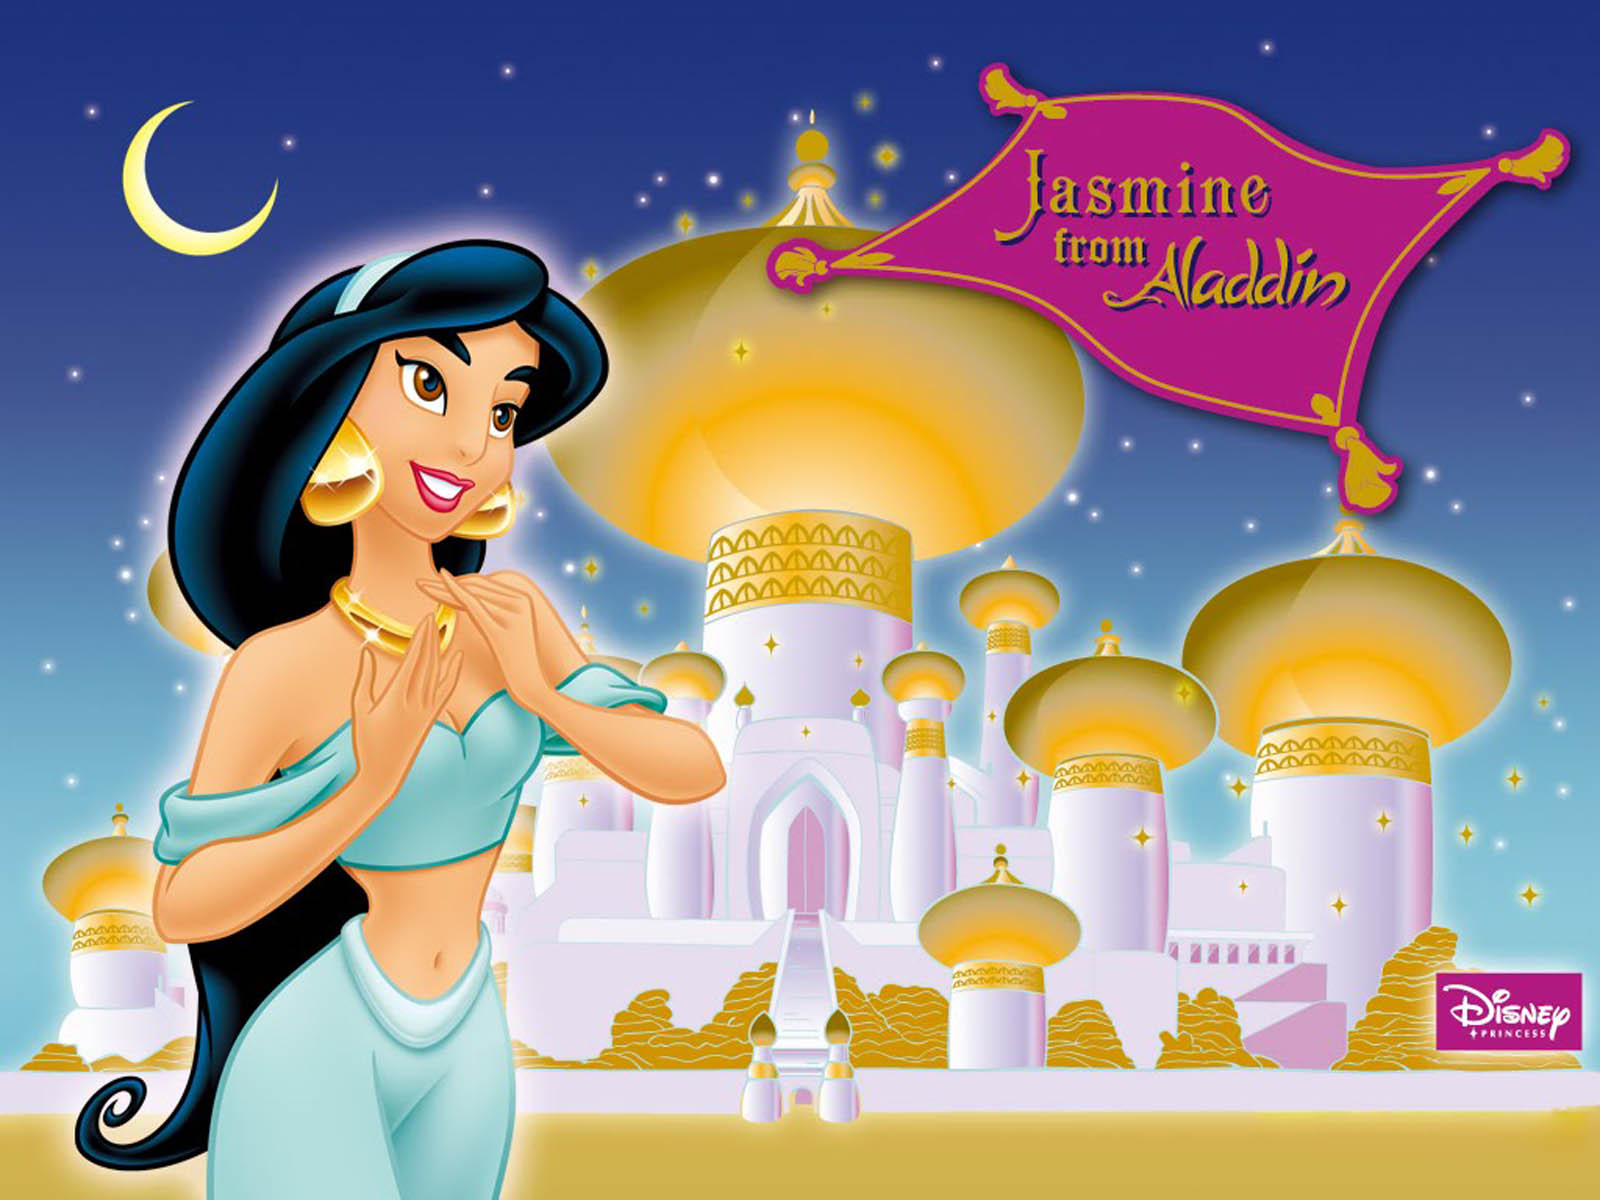 wallpaper disney princess jasmine wallpapers